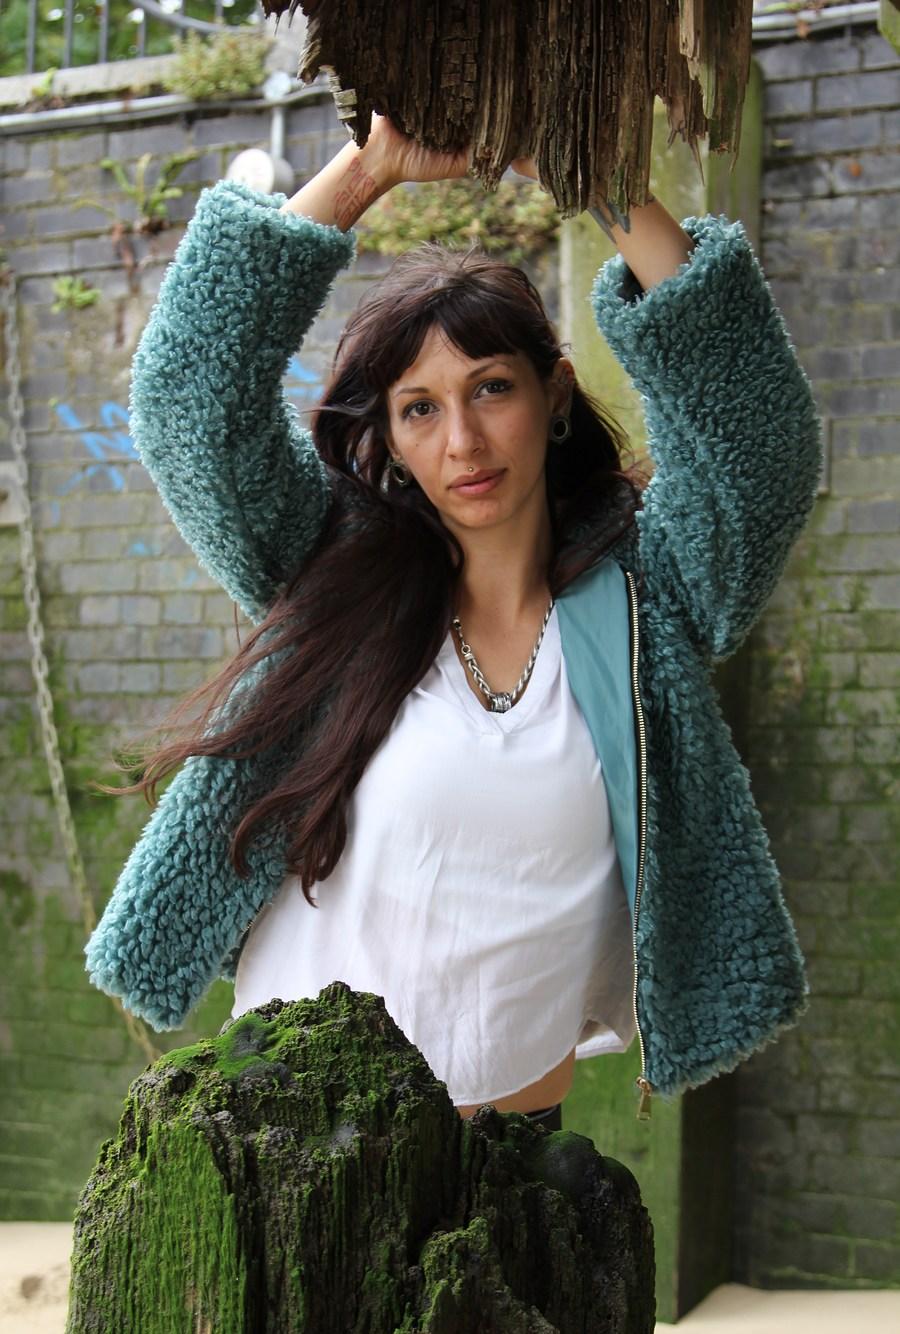 Alice / Photography by DaveinSurrey, Model Alice2188 / Uploaded 2nd September 2020 @ 04:16 PM